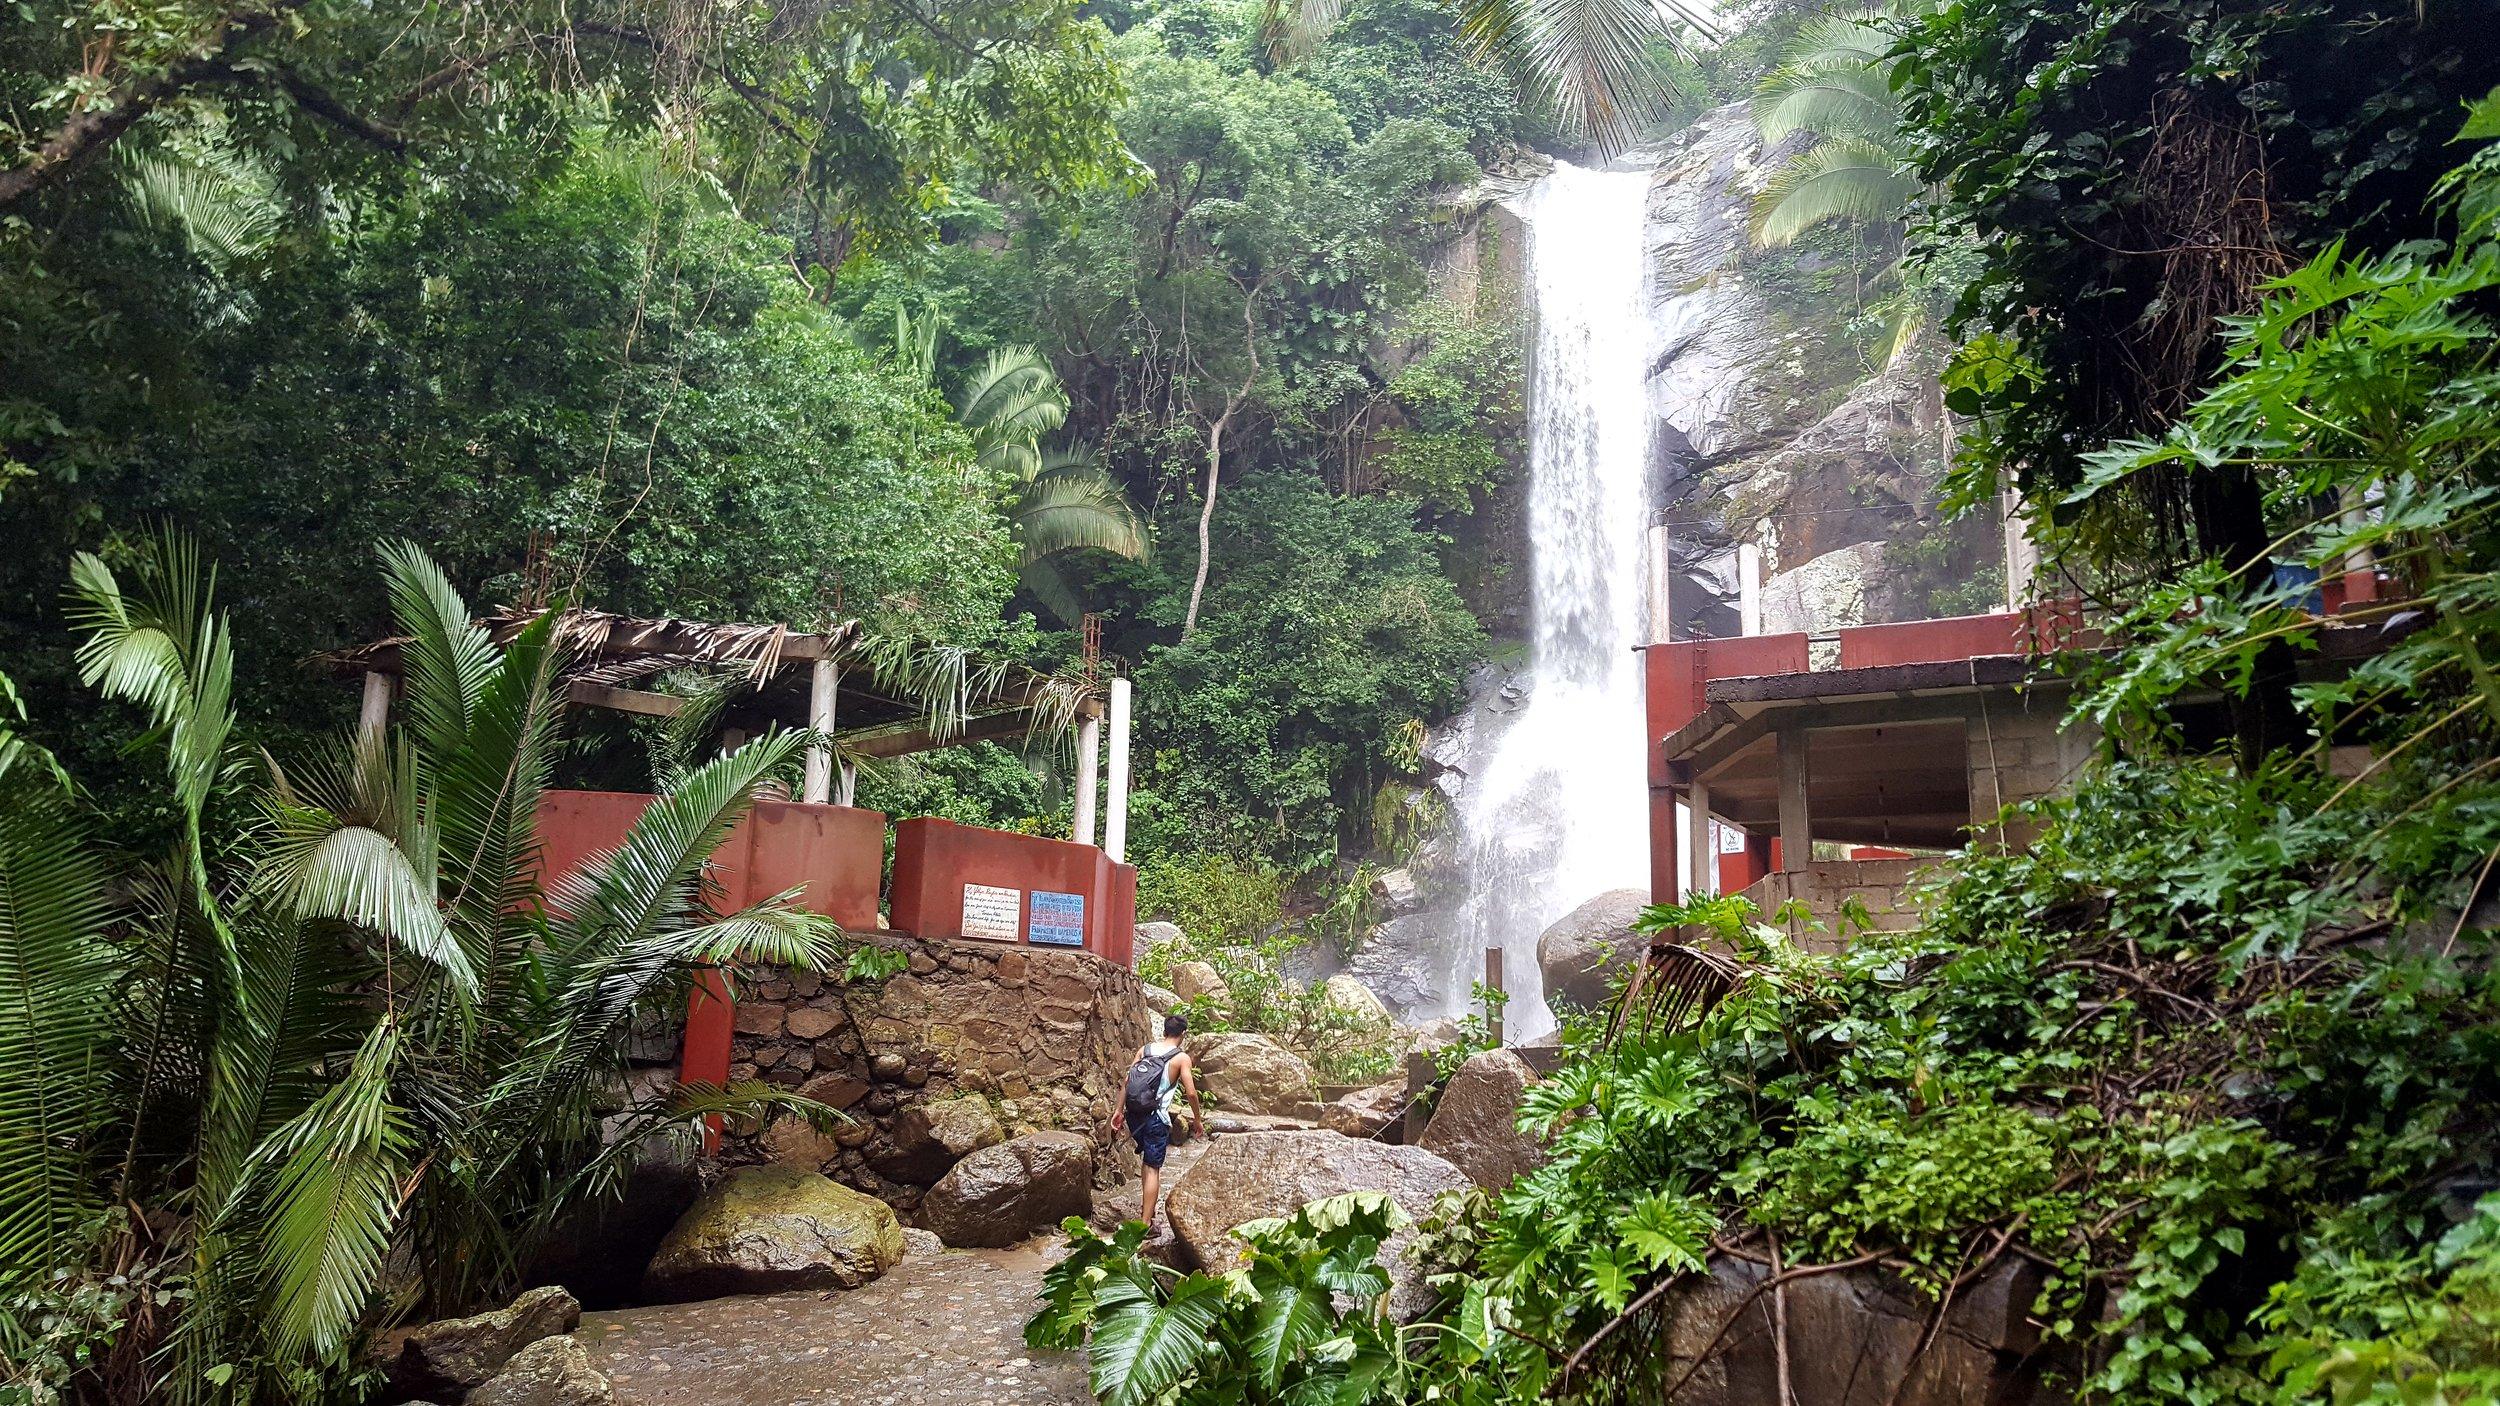 The waterfall in Yelapa towards the end of the rainy season